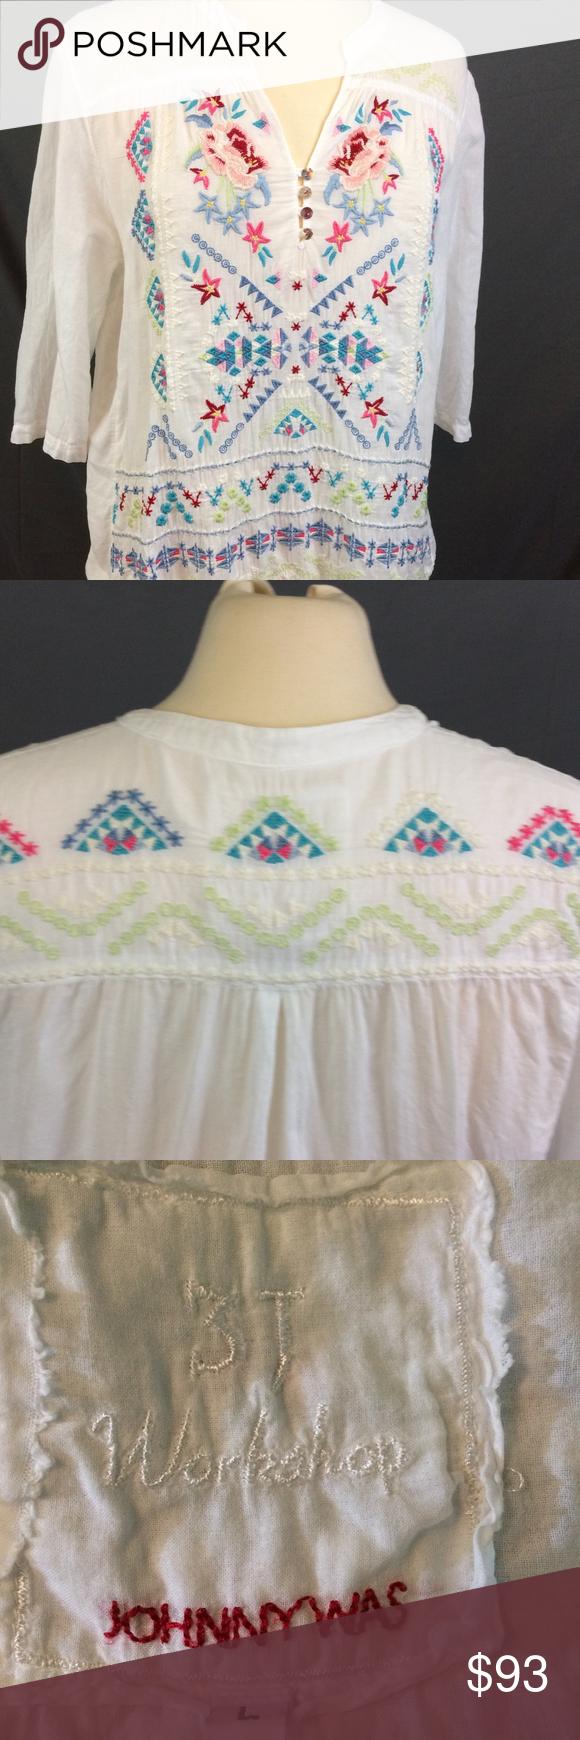 Johnny was yasmine victorian yoke blouse size l the j workshop